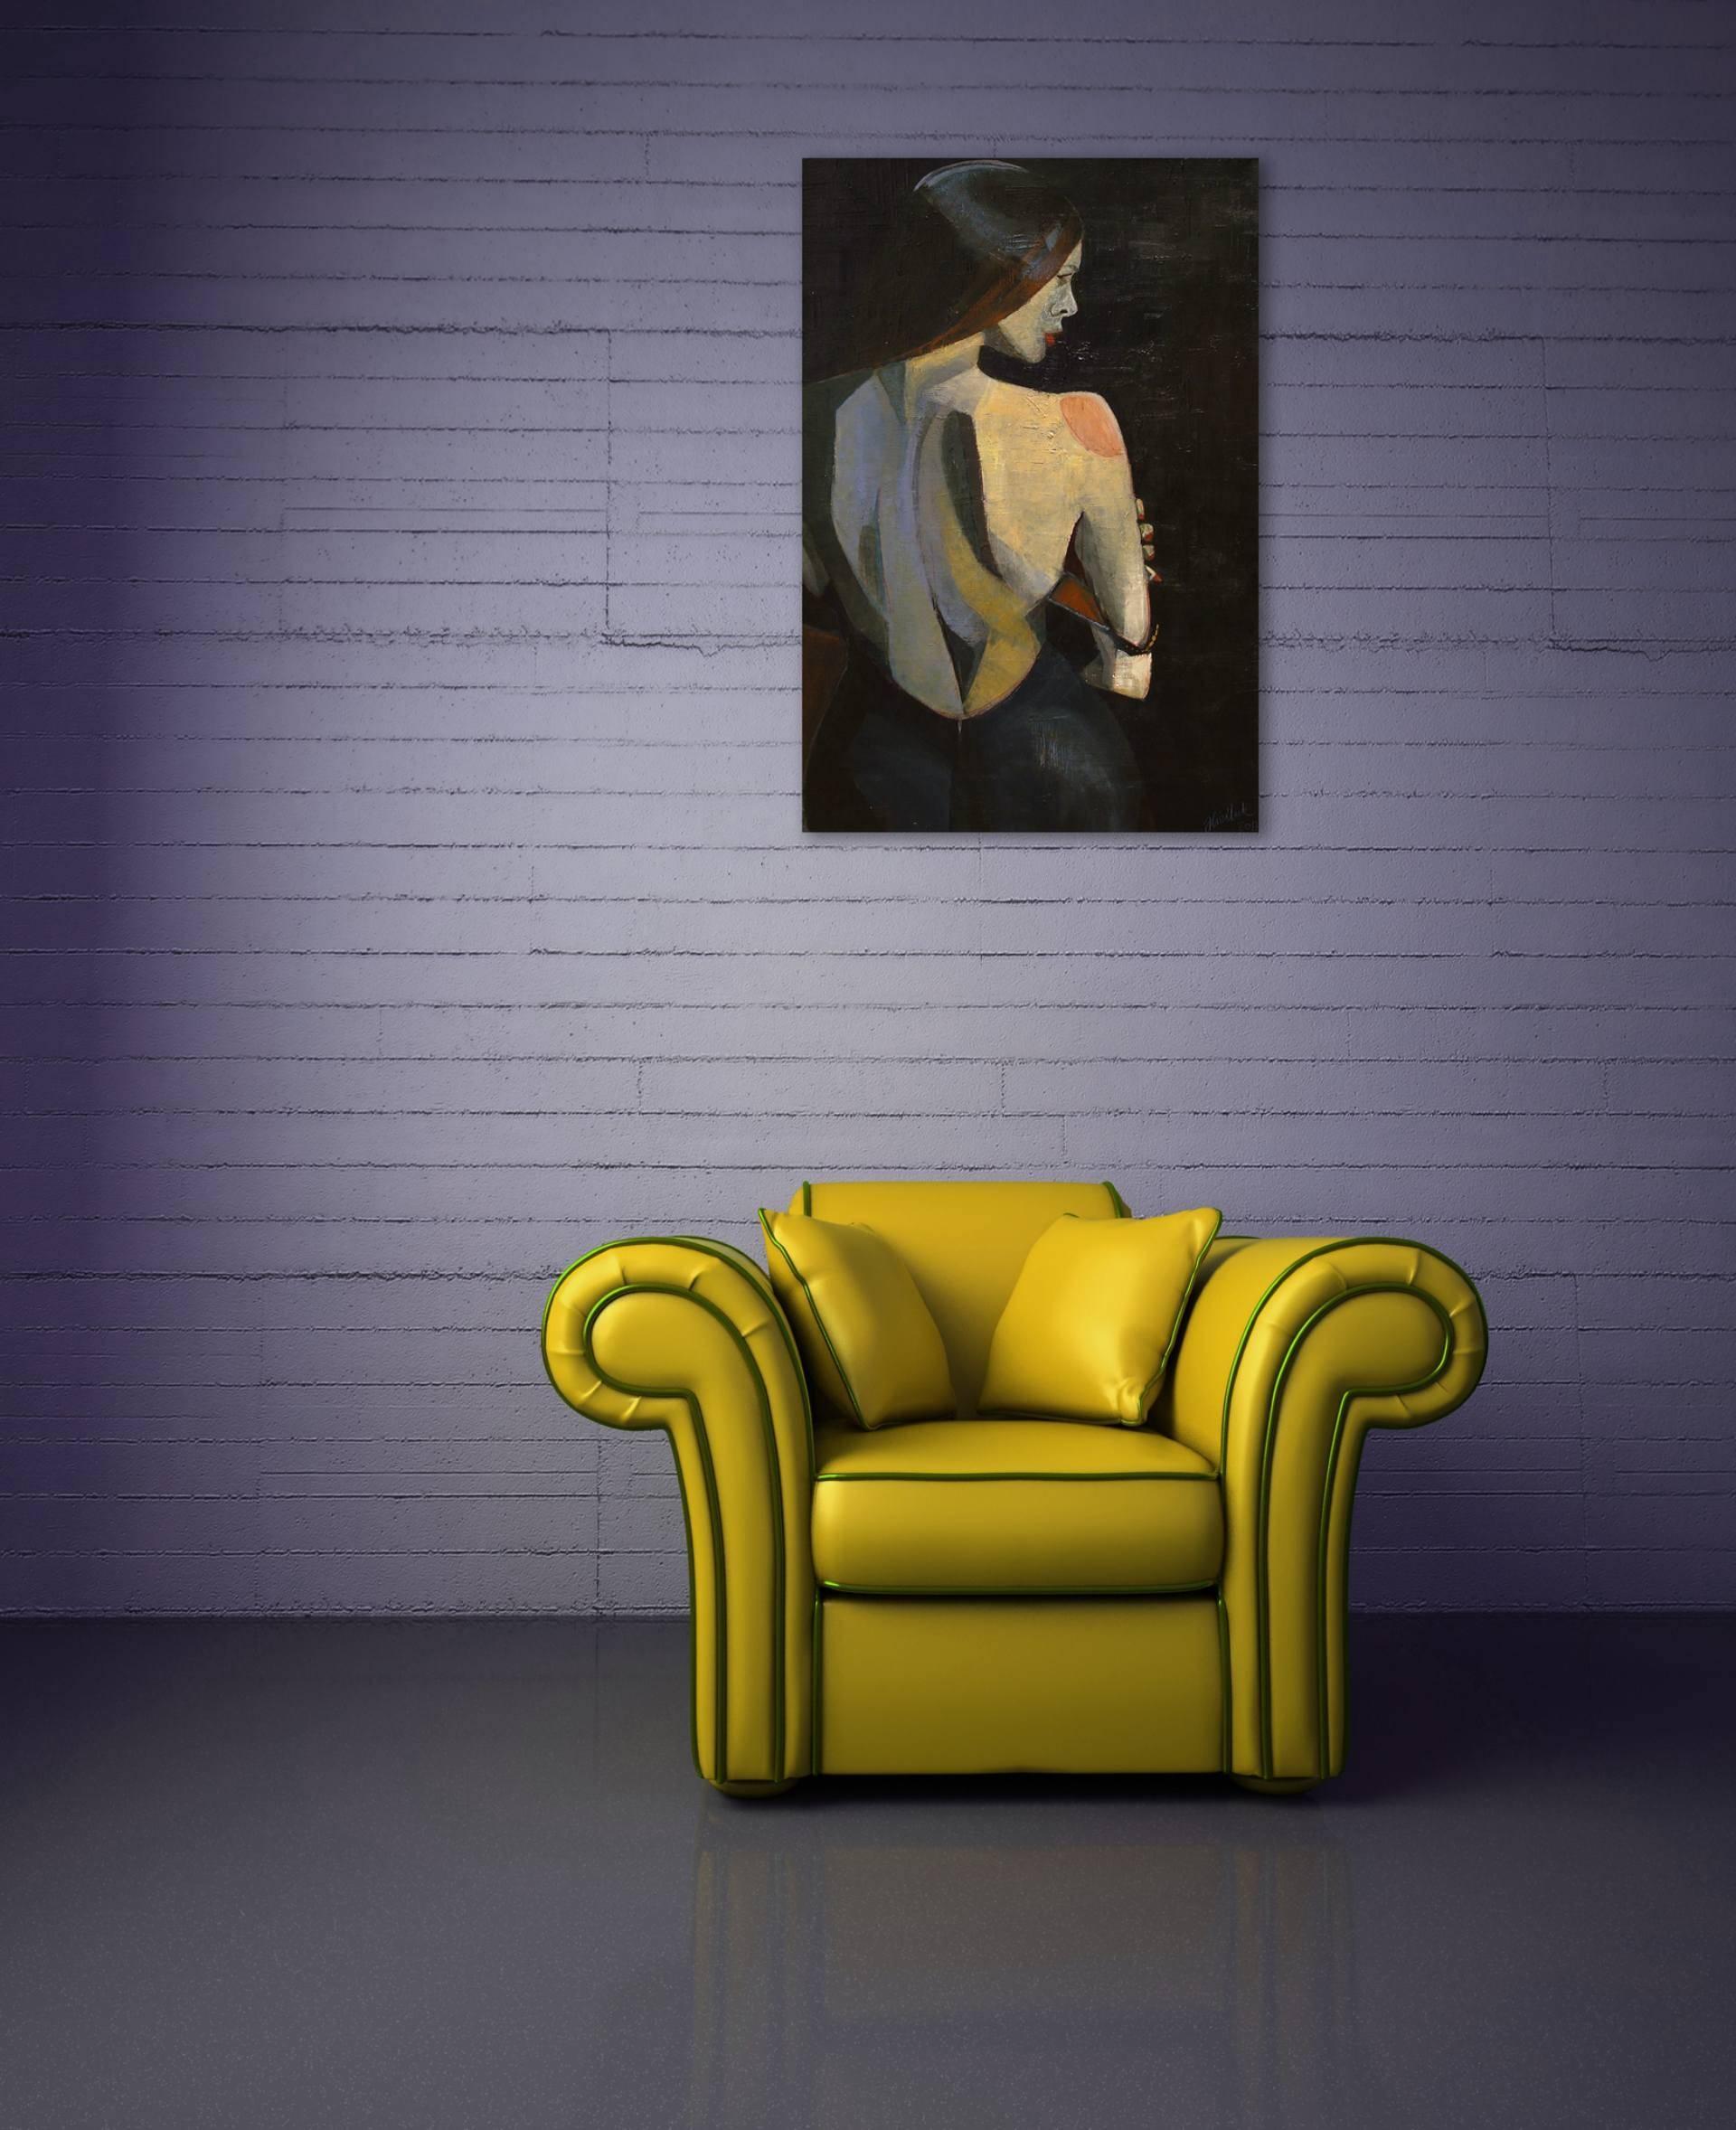 Saatchi Art: Sensual 3 Paintingania Luk Pertaining To Current Sensual Wall Art (View 10 of 20)